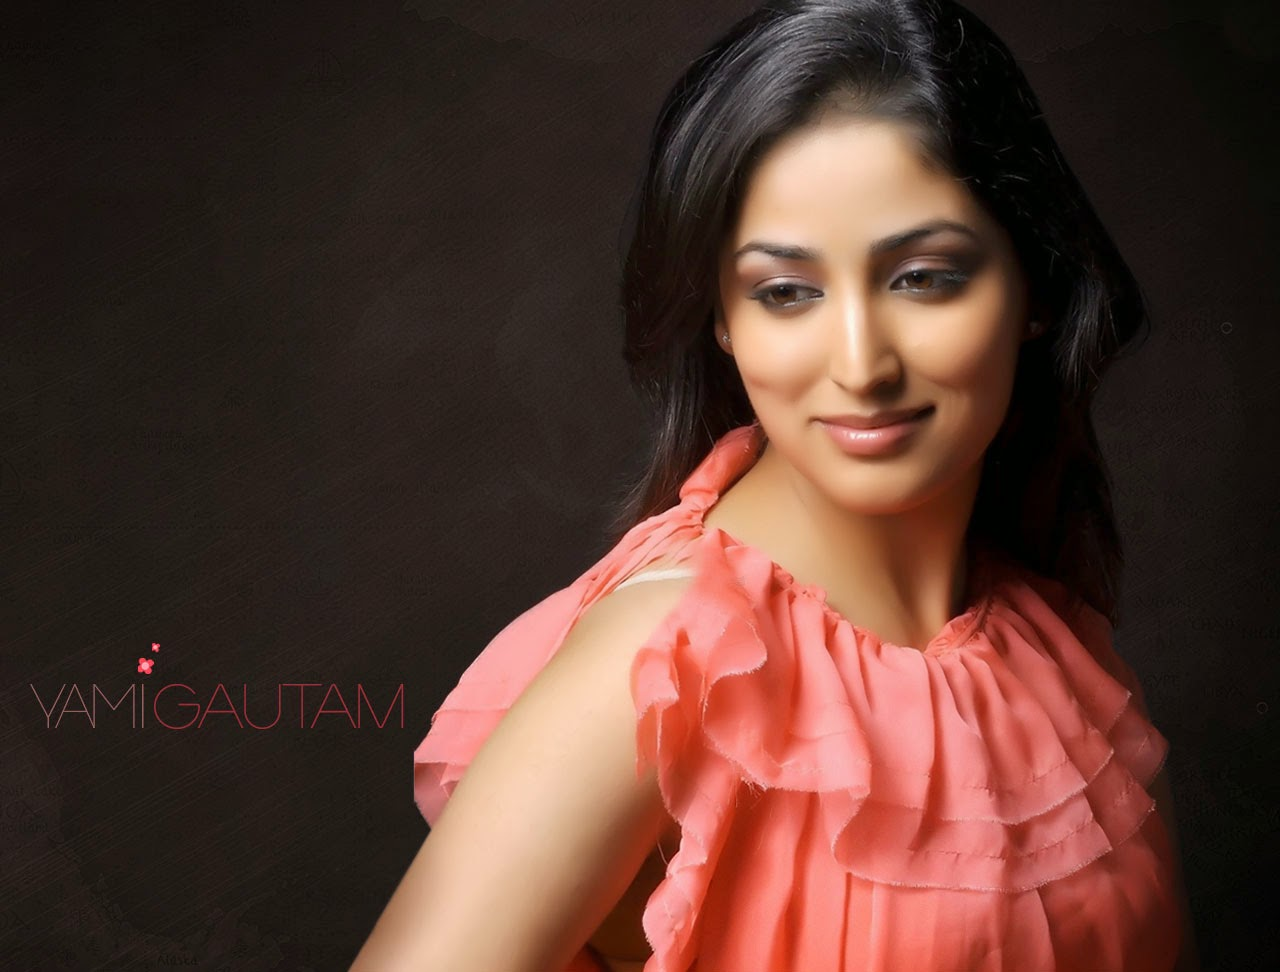 Yami Gautam Hd Pics: Wellcome To Bollywood HD Wallpapers: Yami Gautam Bollywood